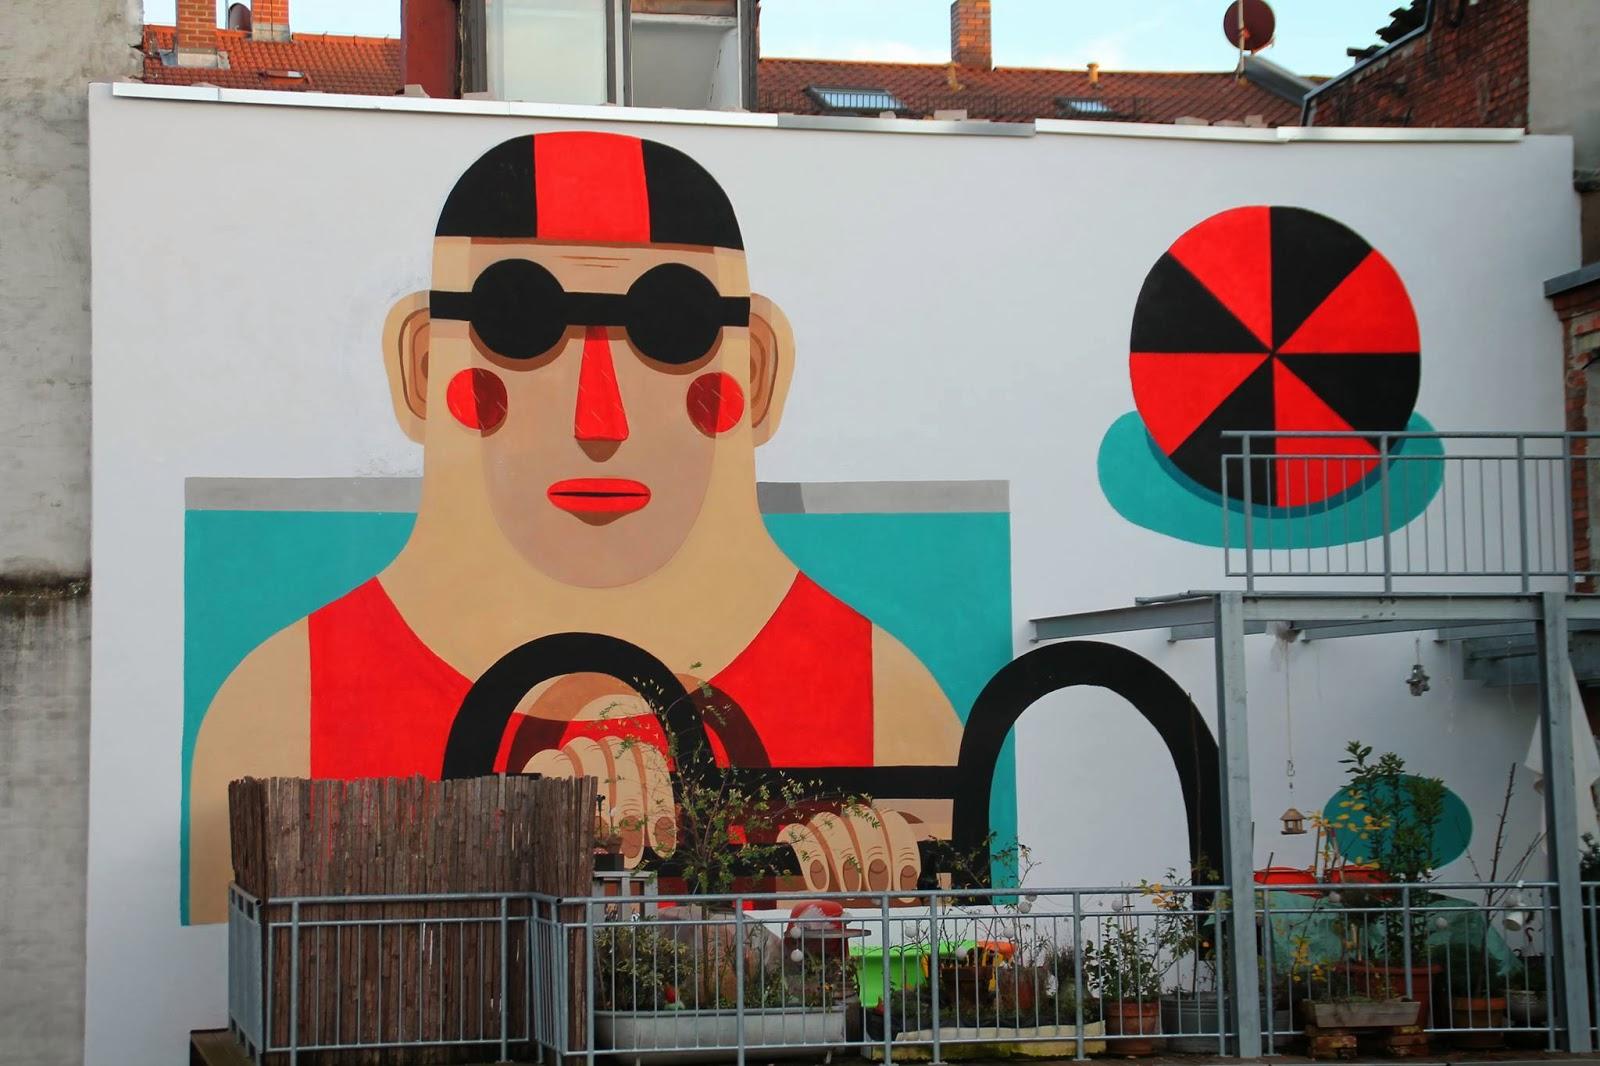 agostino-iacurci-new-mural-nuremberg-germany-01